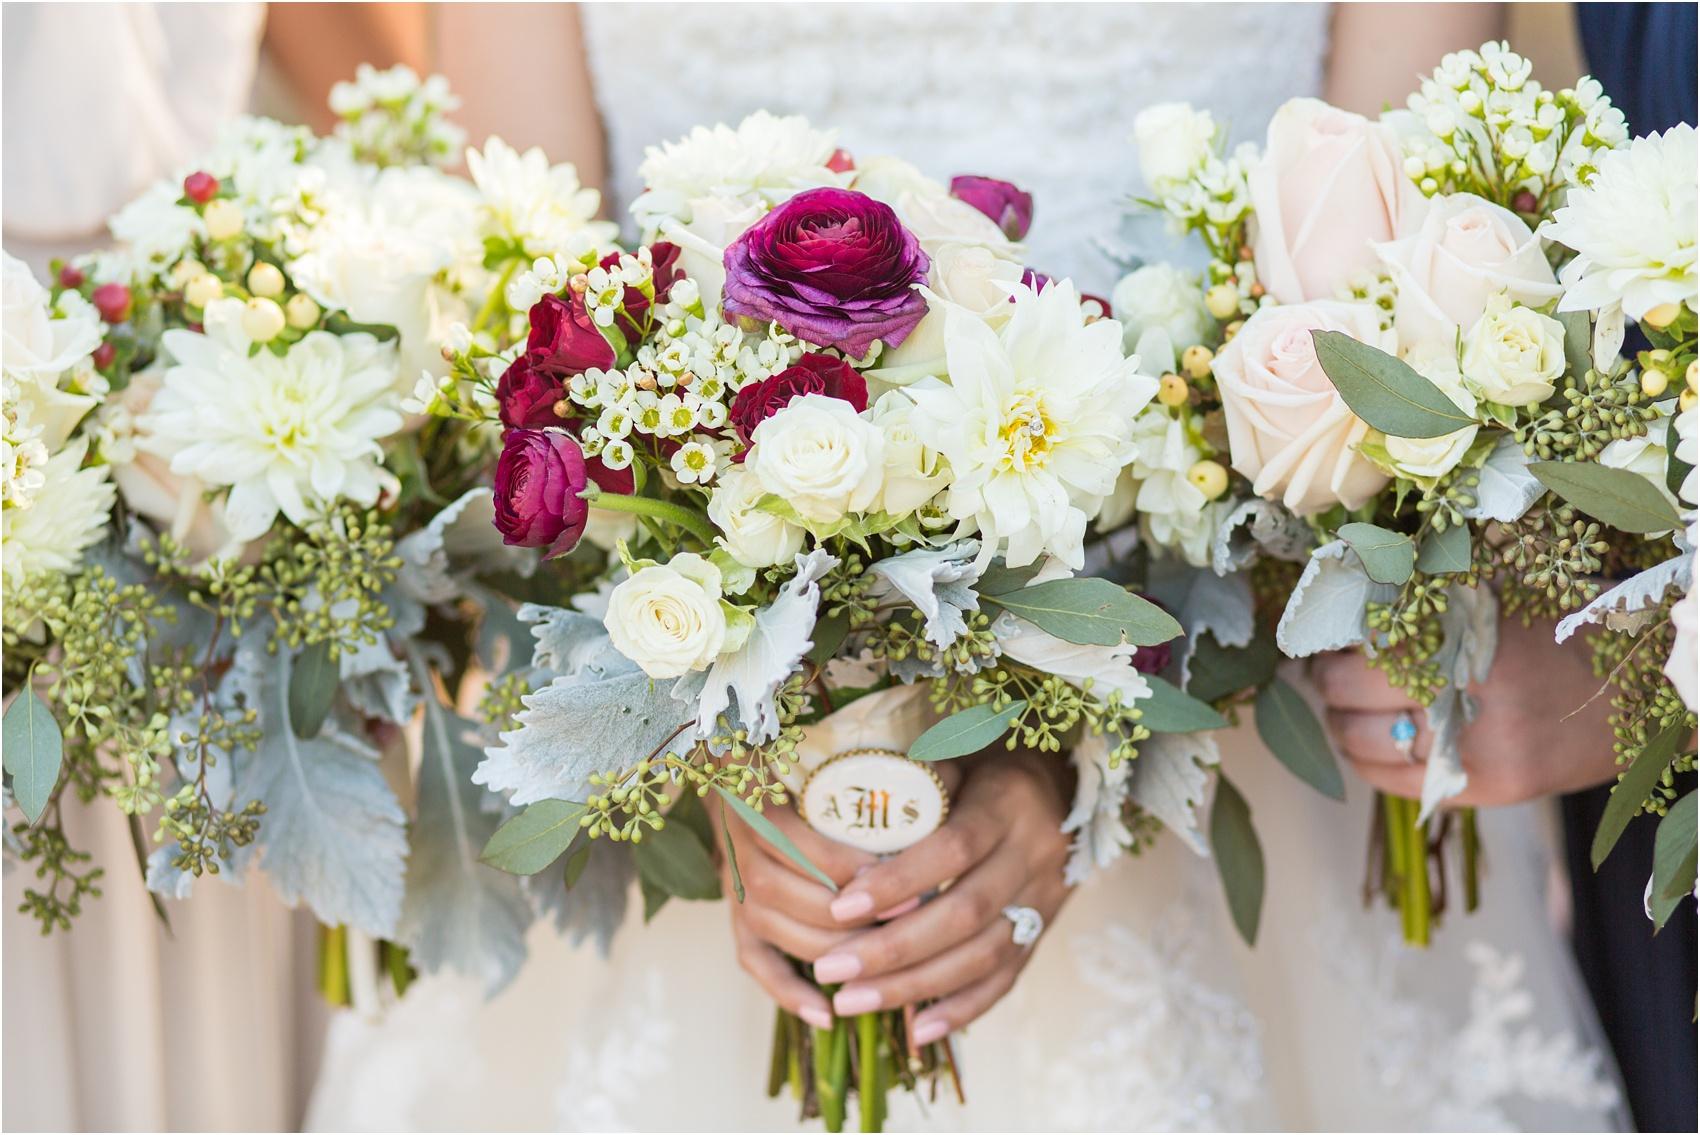 Savannah Eve Photography- May Wedding- Blog-8.jpg